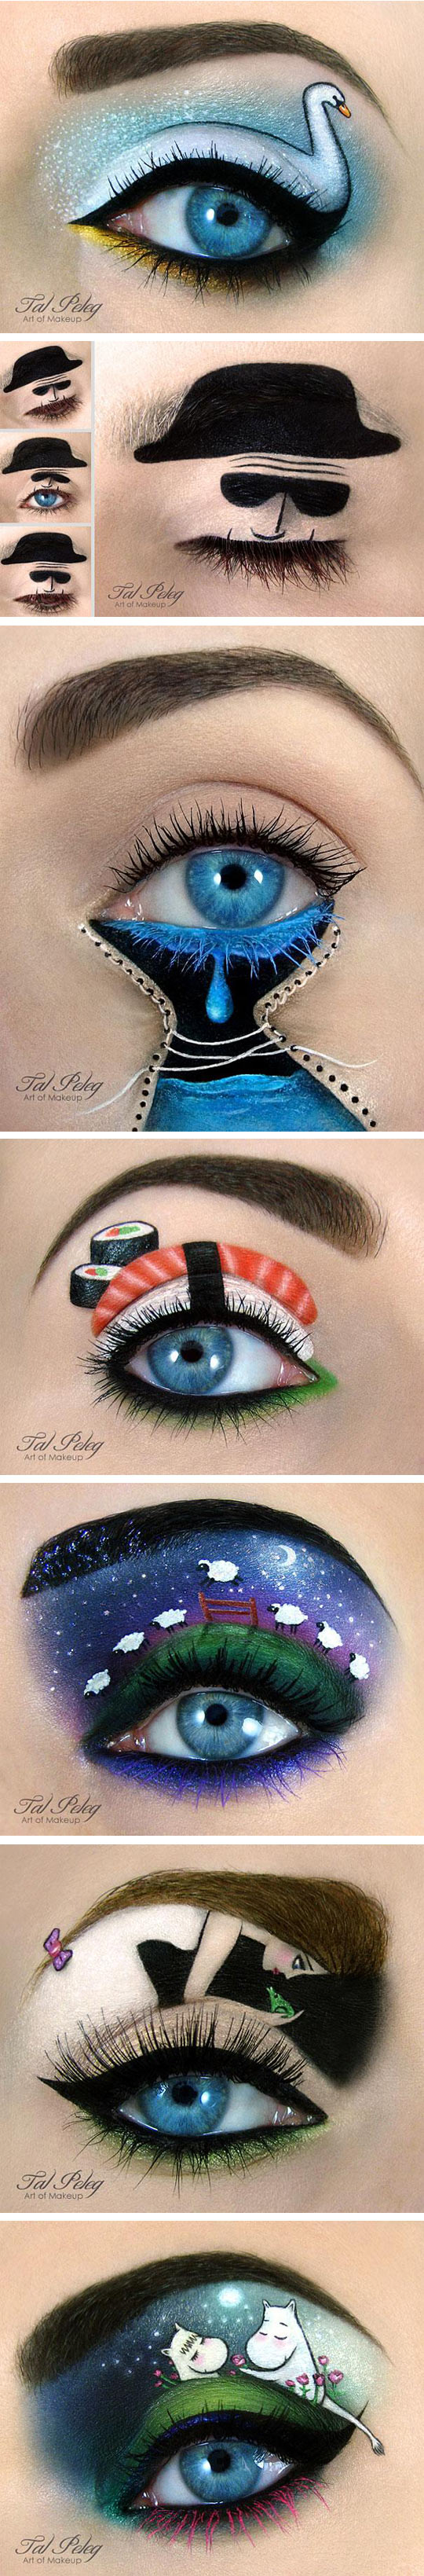 cool-eye-makeup-cat-colors-art